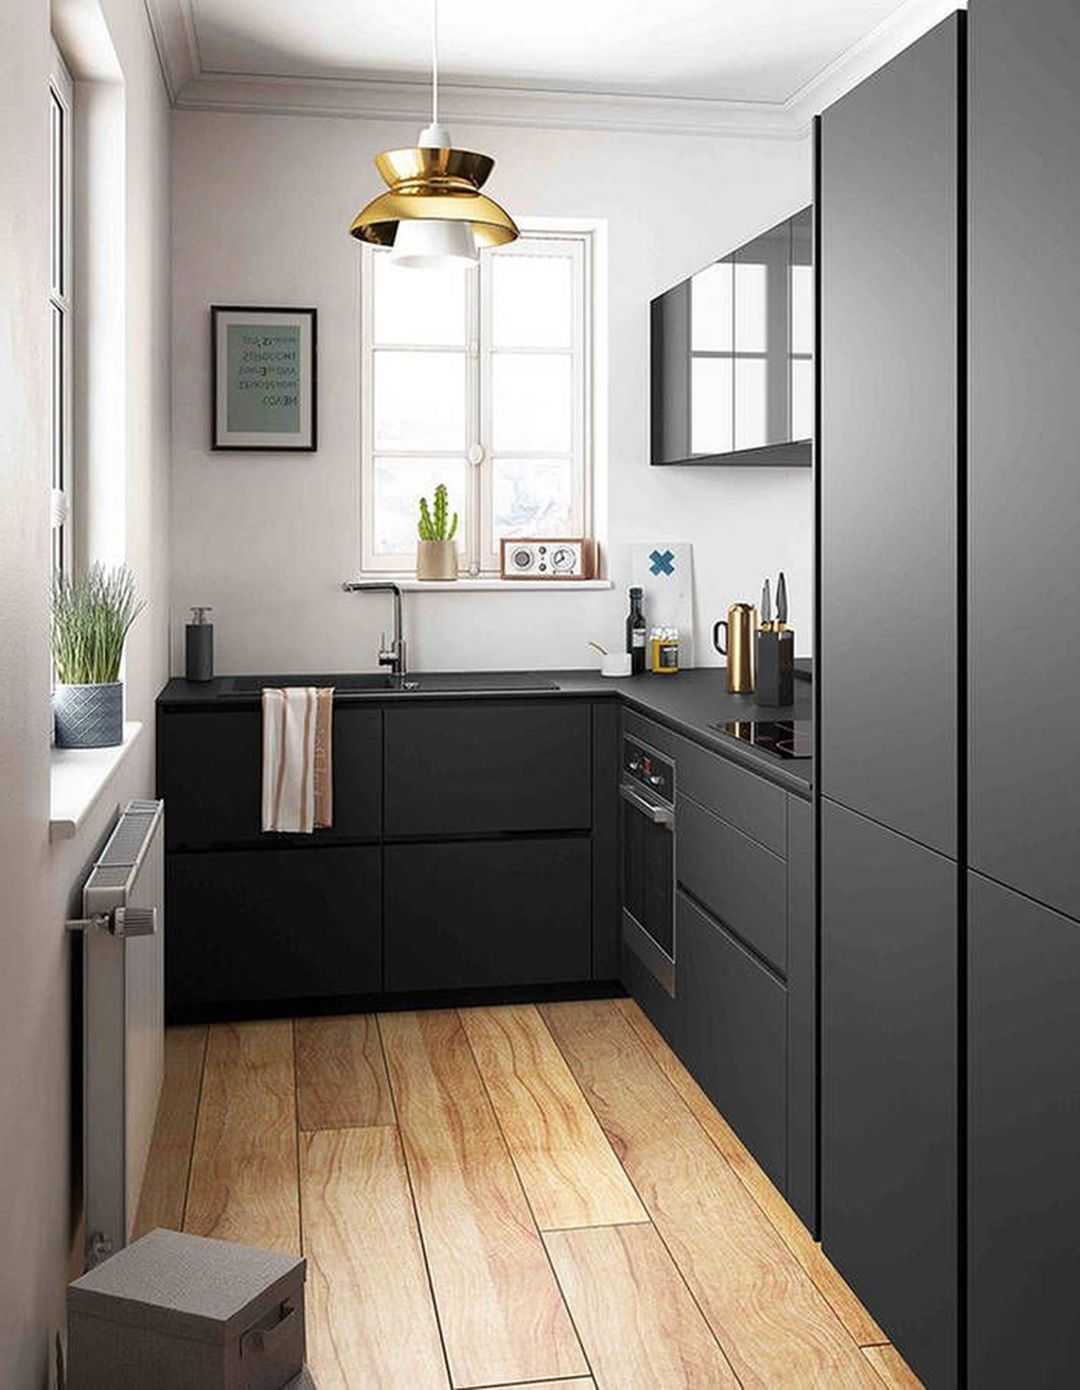 2020 small modern kitchen ideas   Small modern kitchens ...